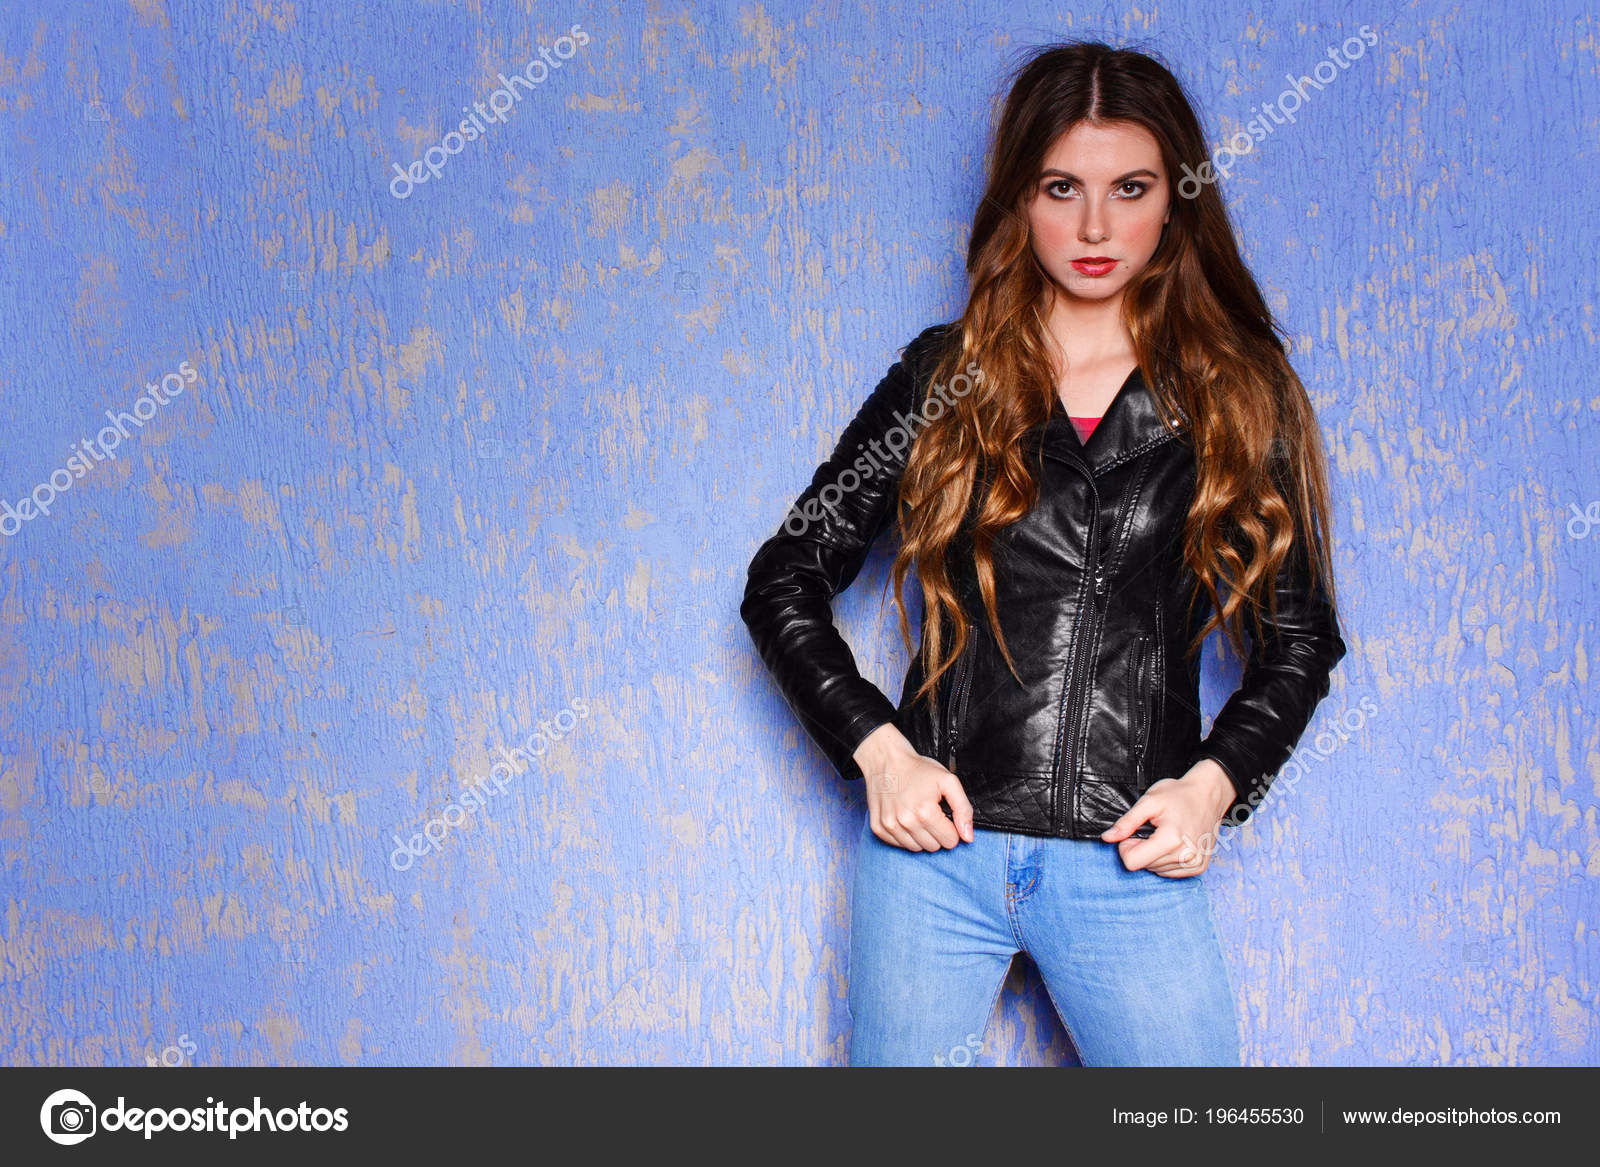 Fashion Model Black Leather Jacket Pixie Cut Hairstyle Punk Rock